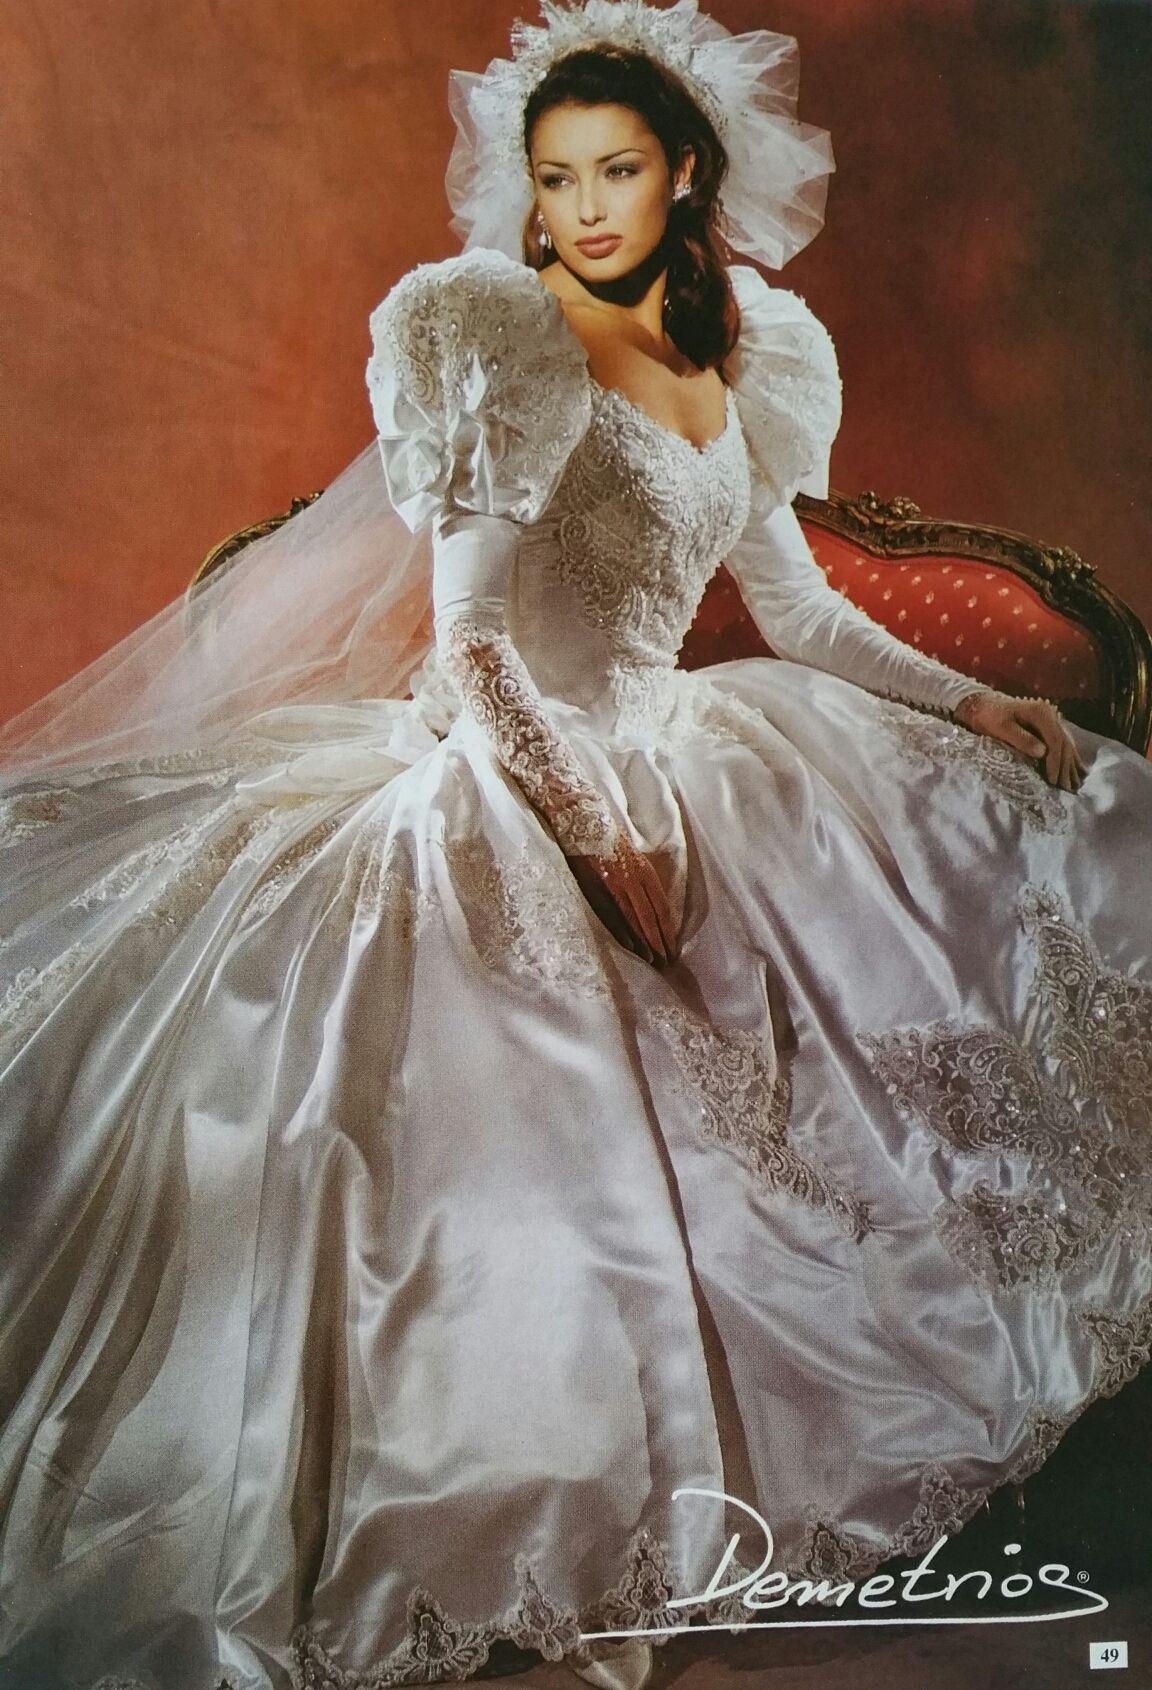 Demetrios demetrios pinterest wedding dress gowns and